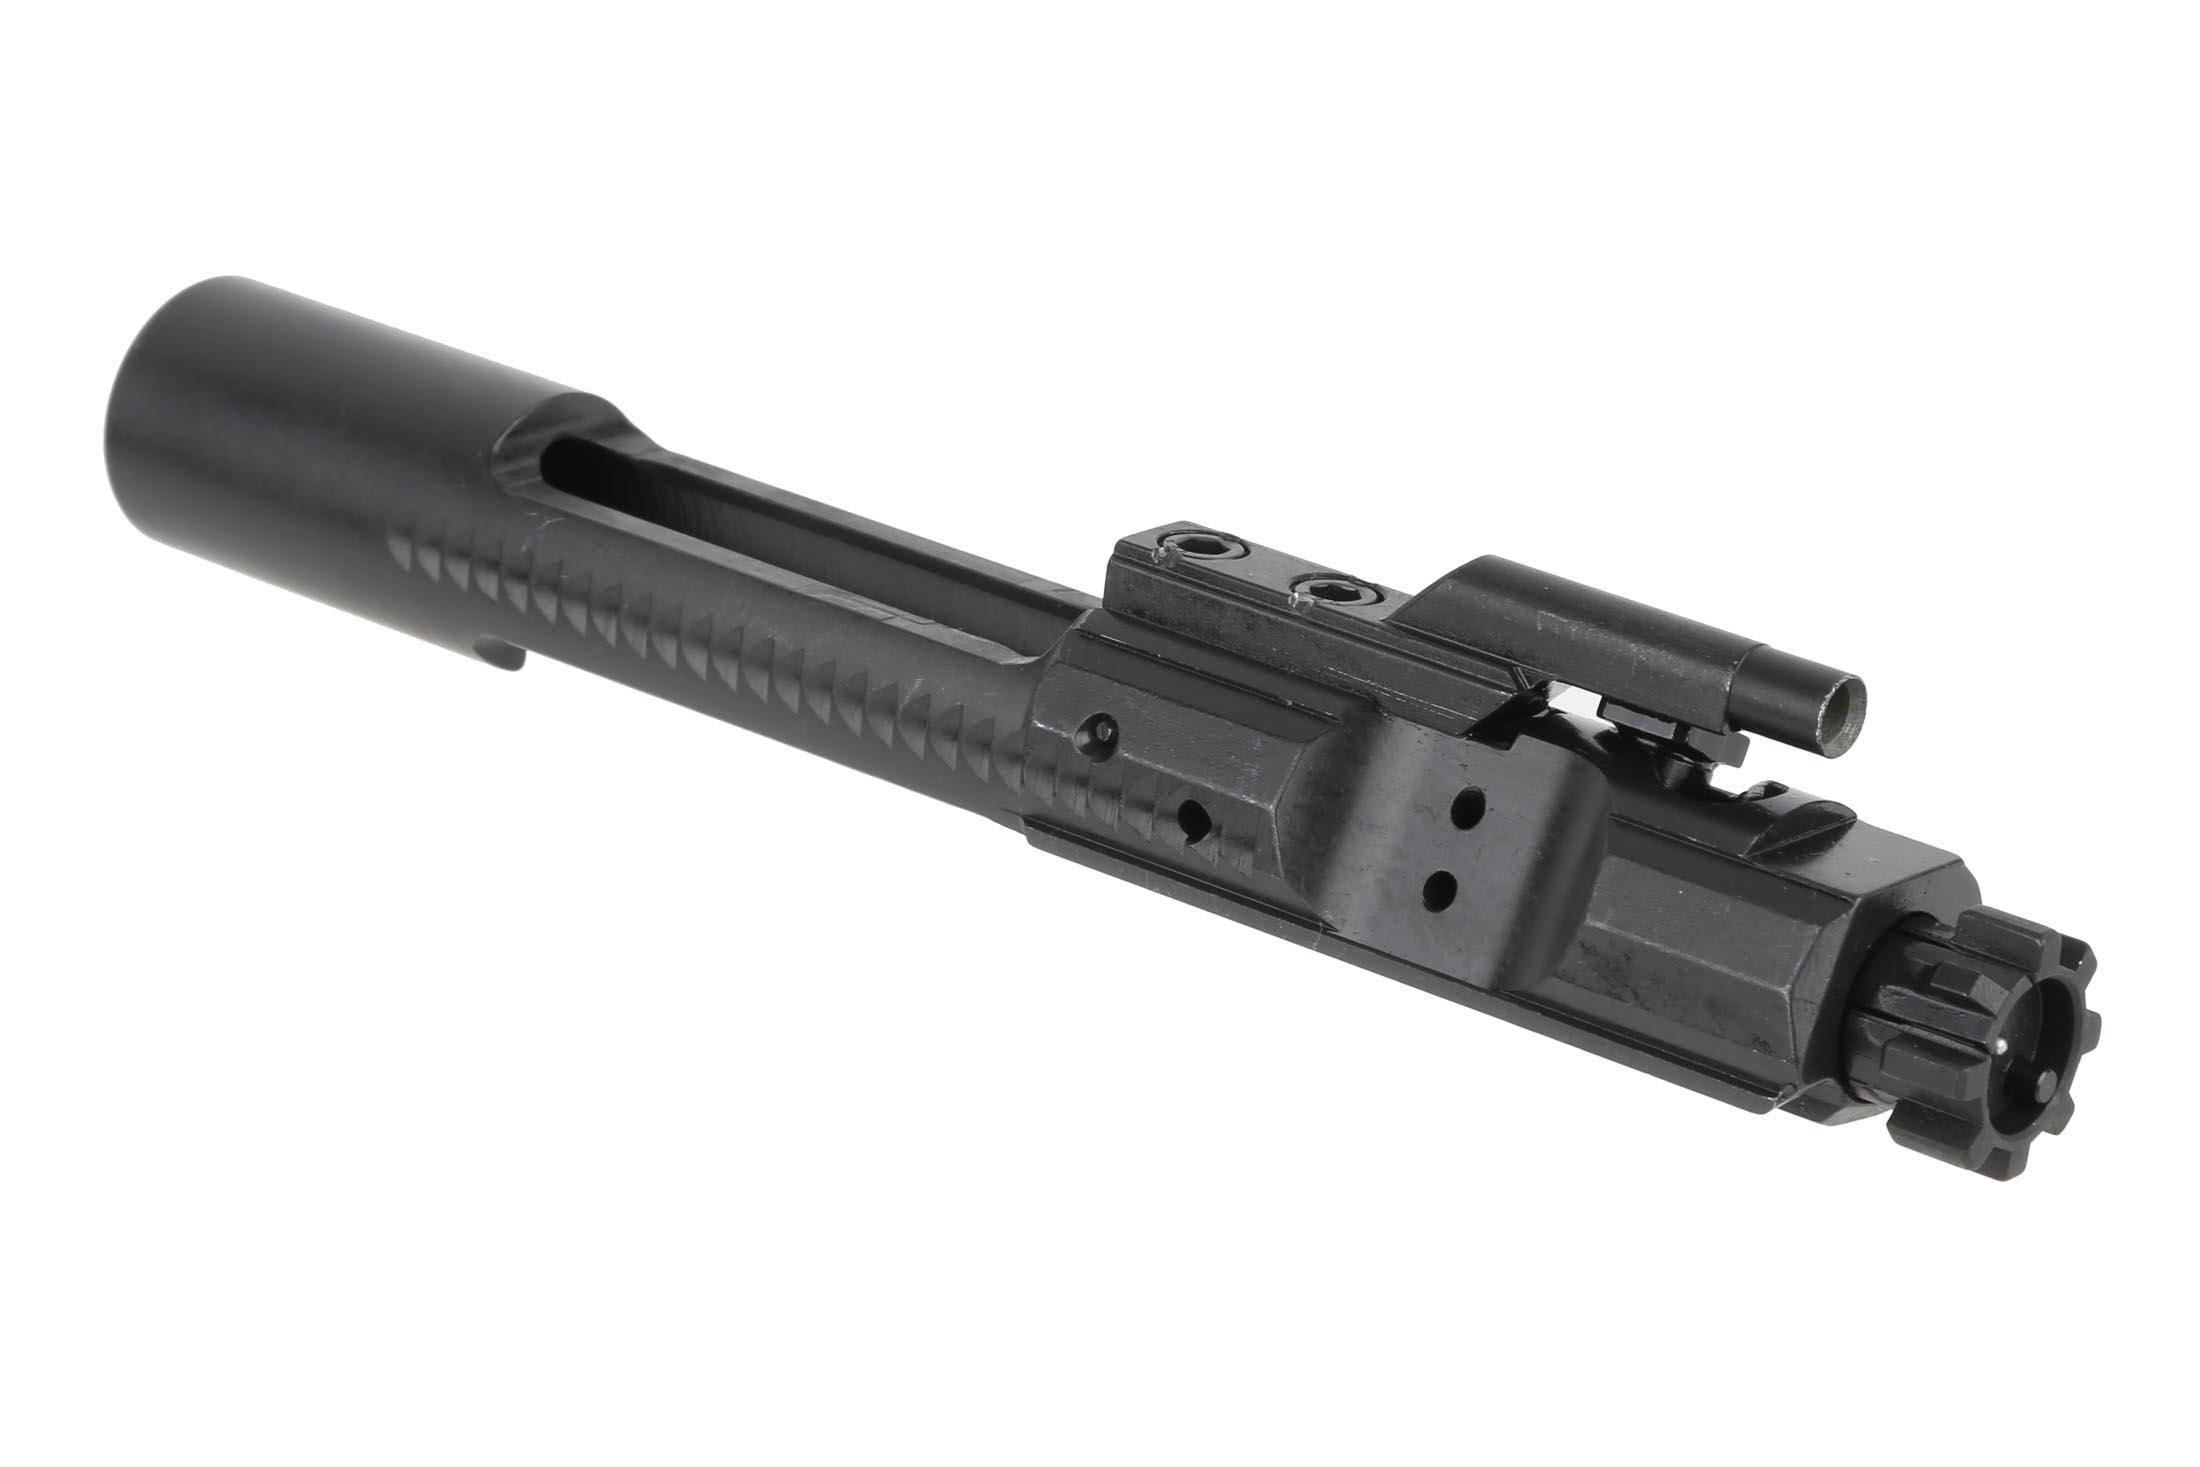 Bear Creek Arsenal M16 Cut 7.62x39mm Complete Bolt Carrier Group - Black Nitride BCA-BCG762-15